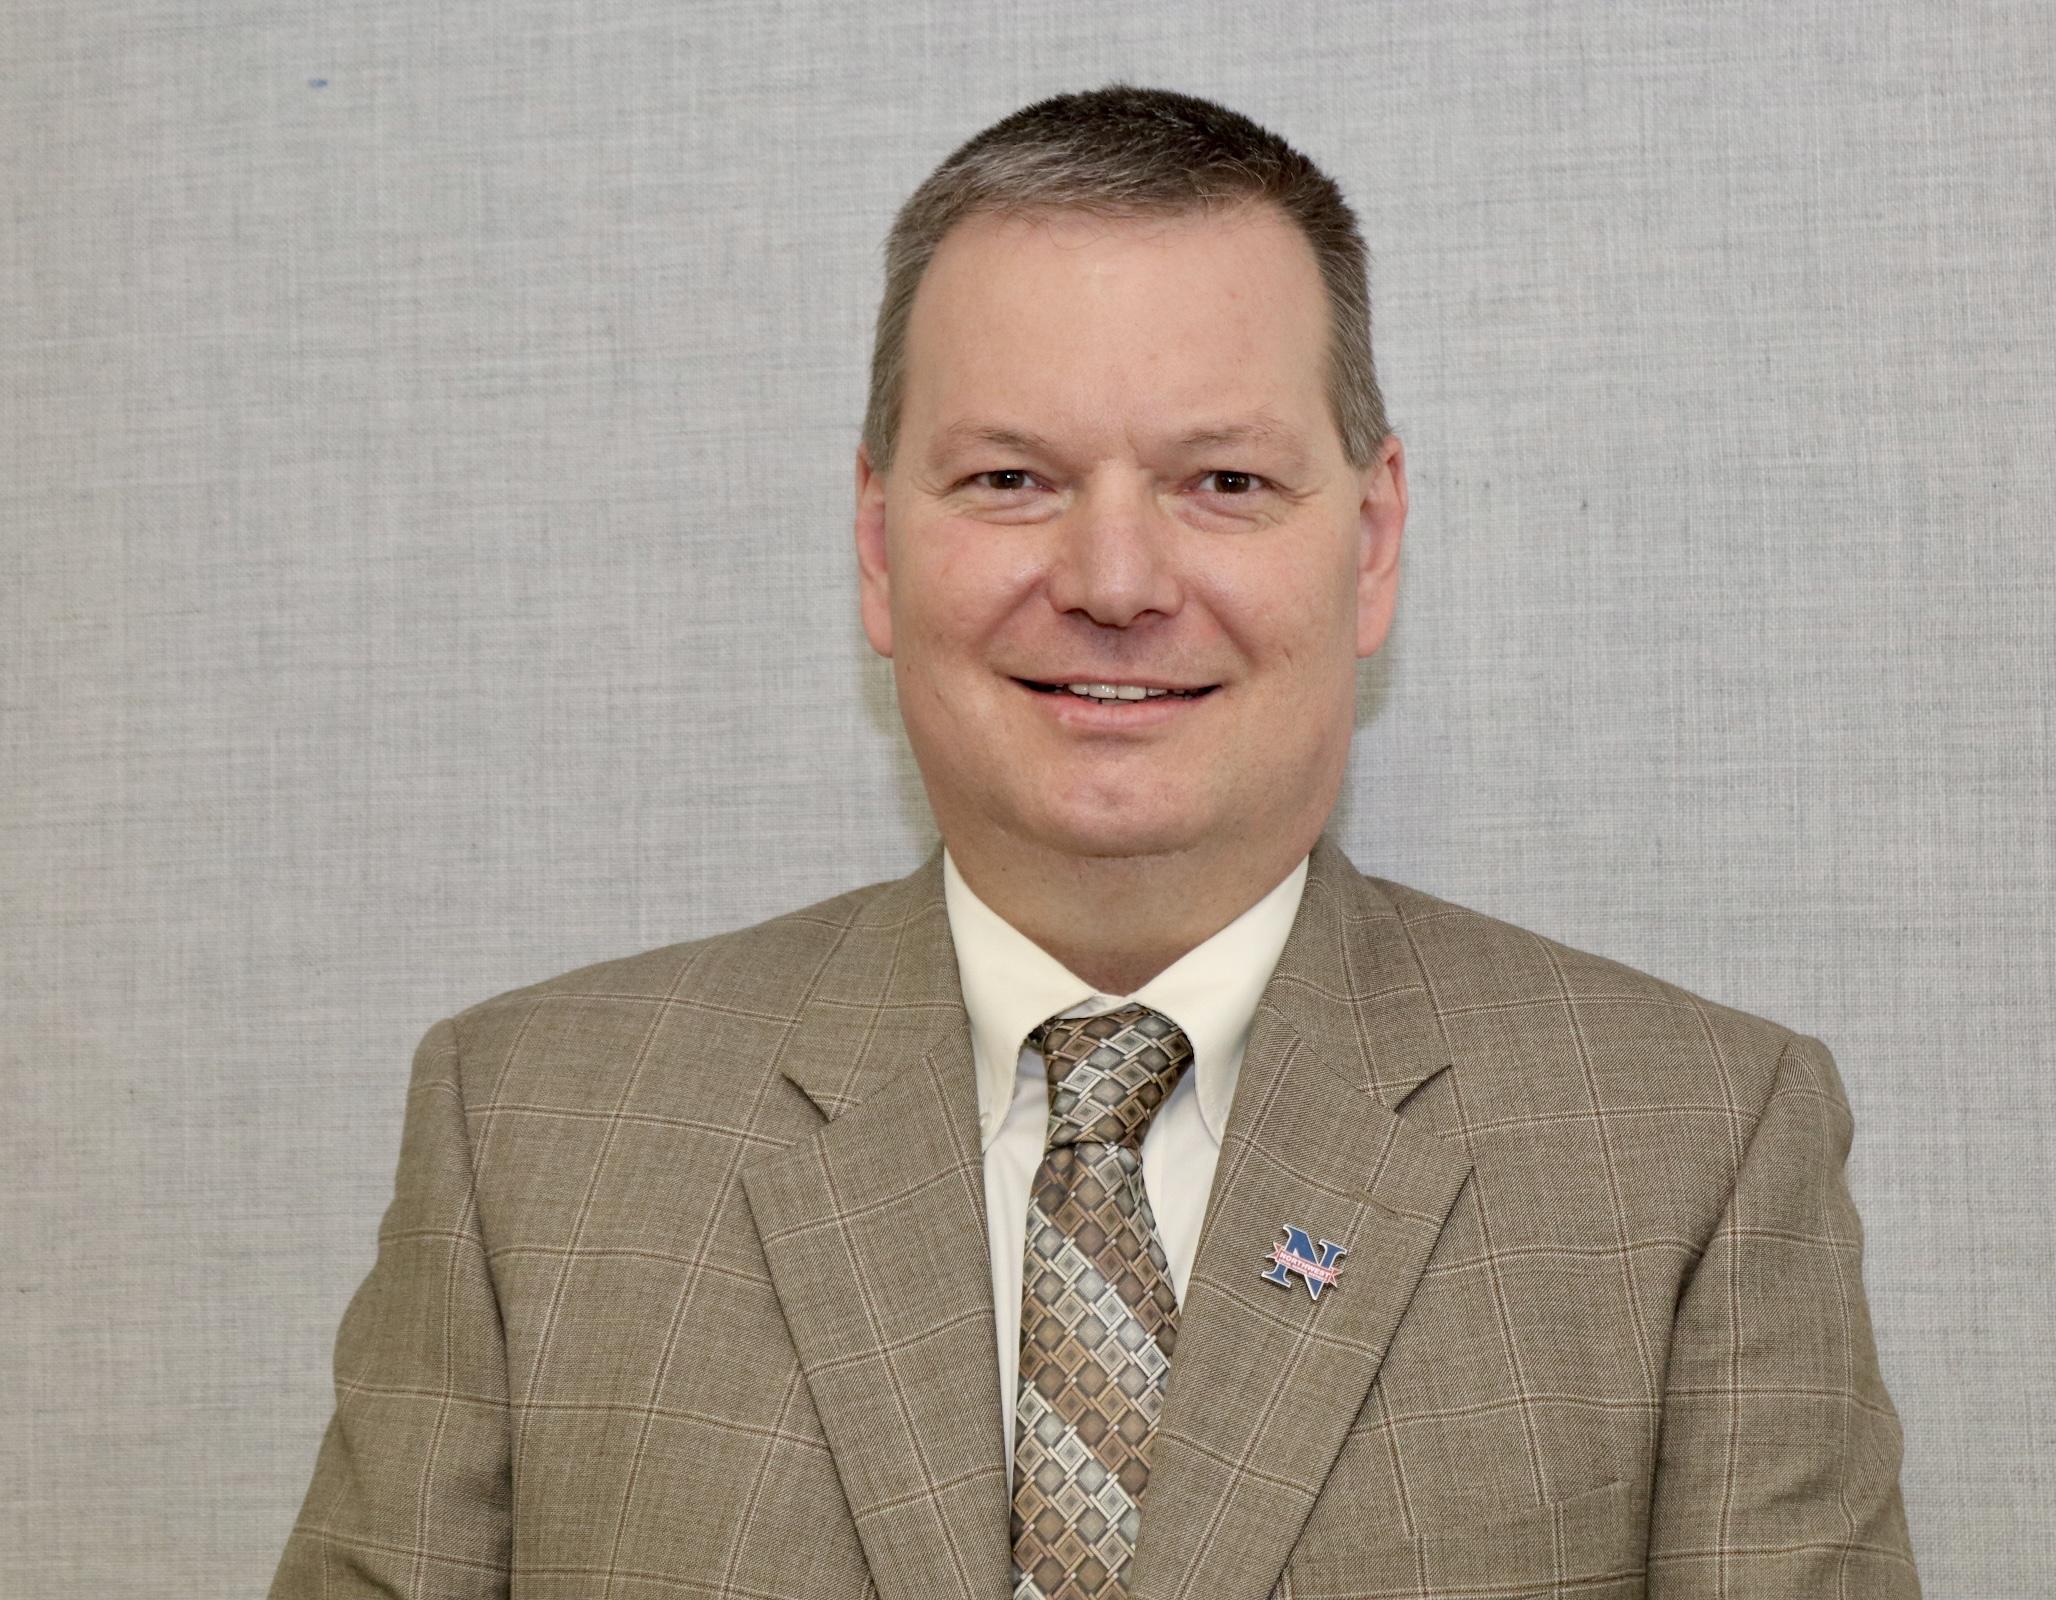 Darrell Yater, NWLSD Interim Superintendent